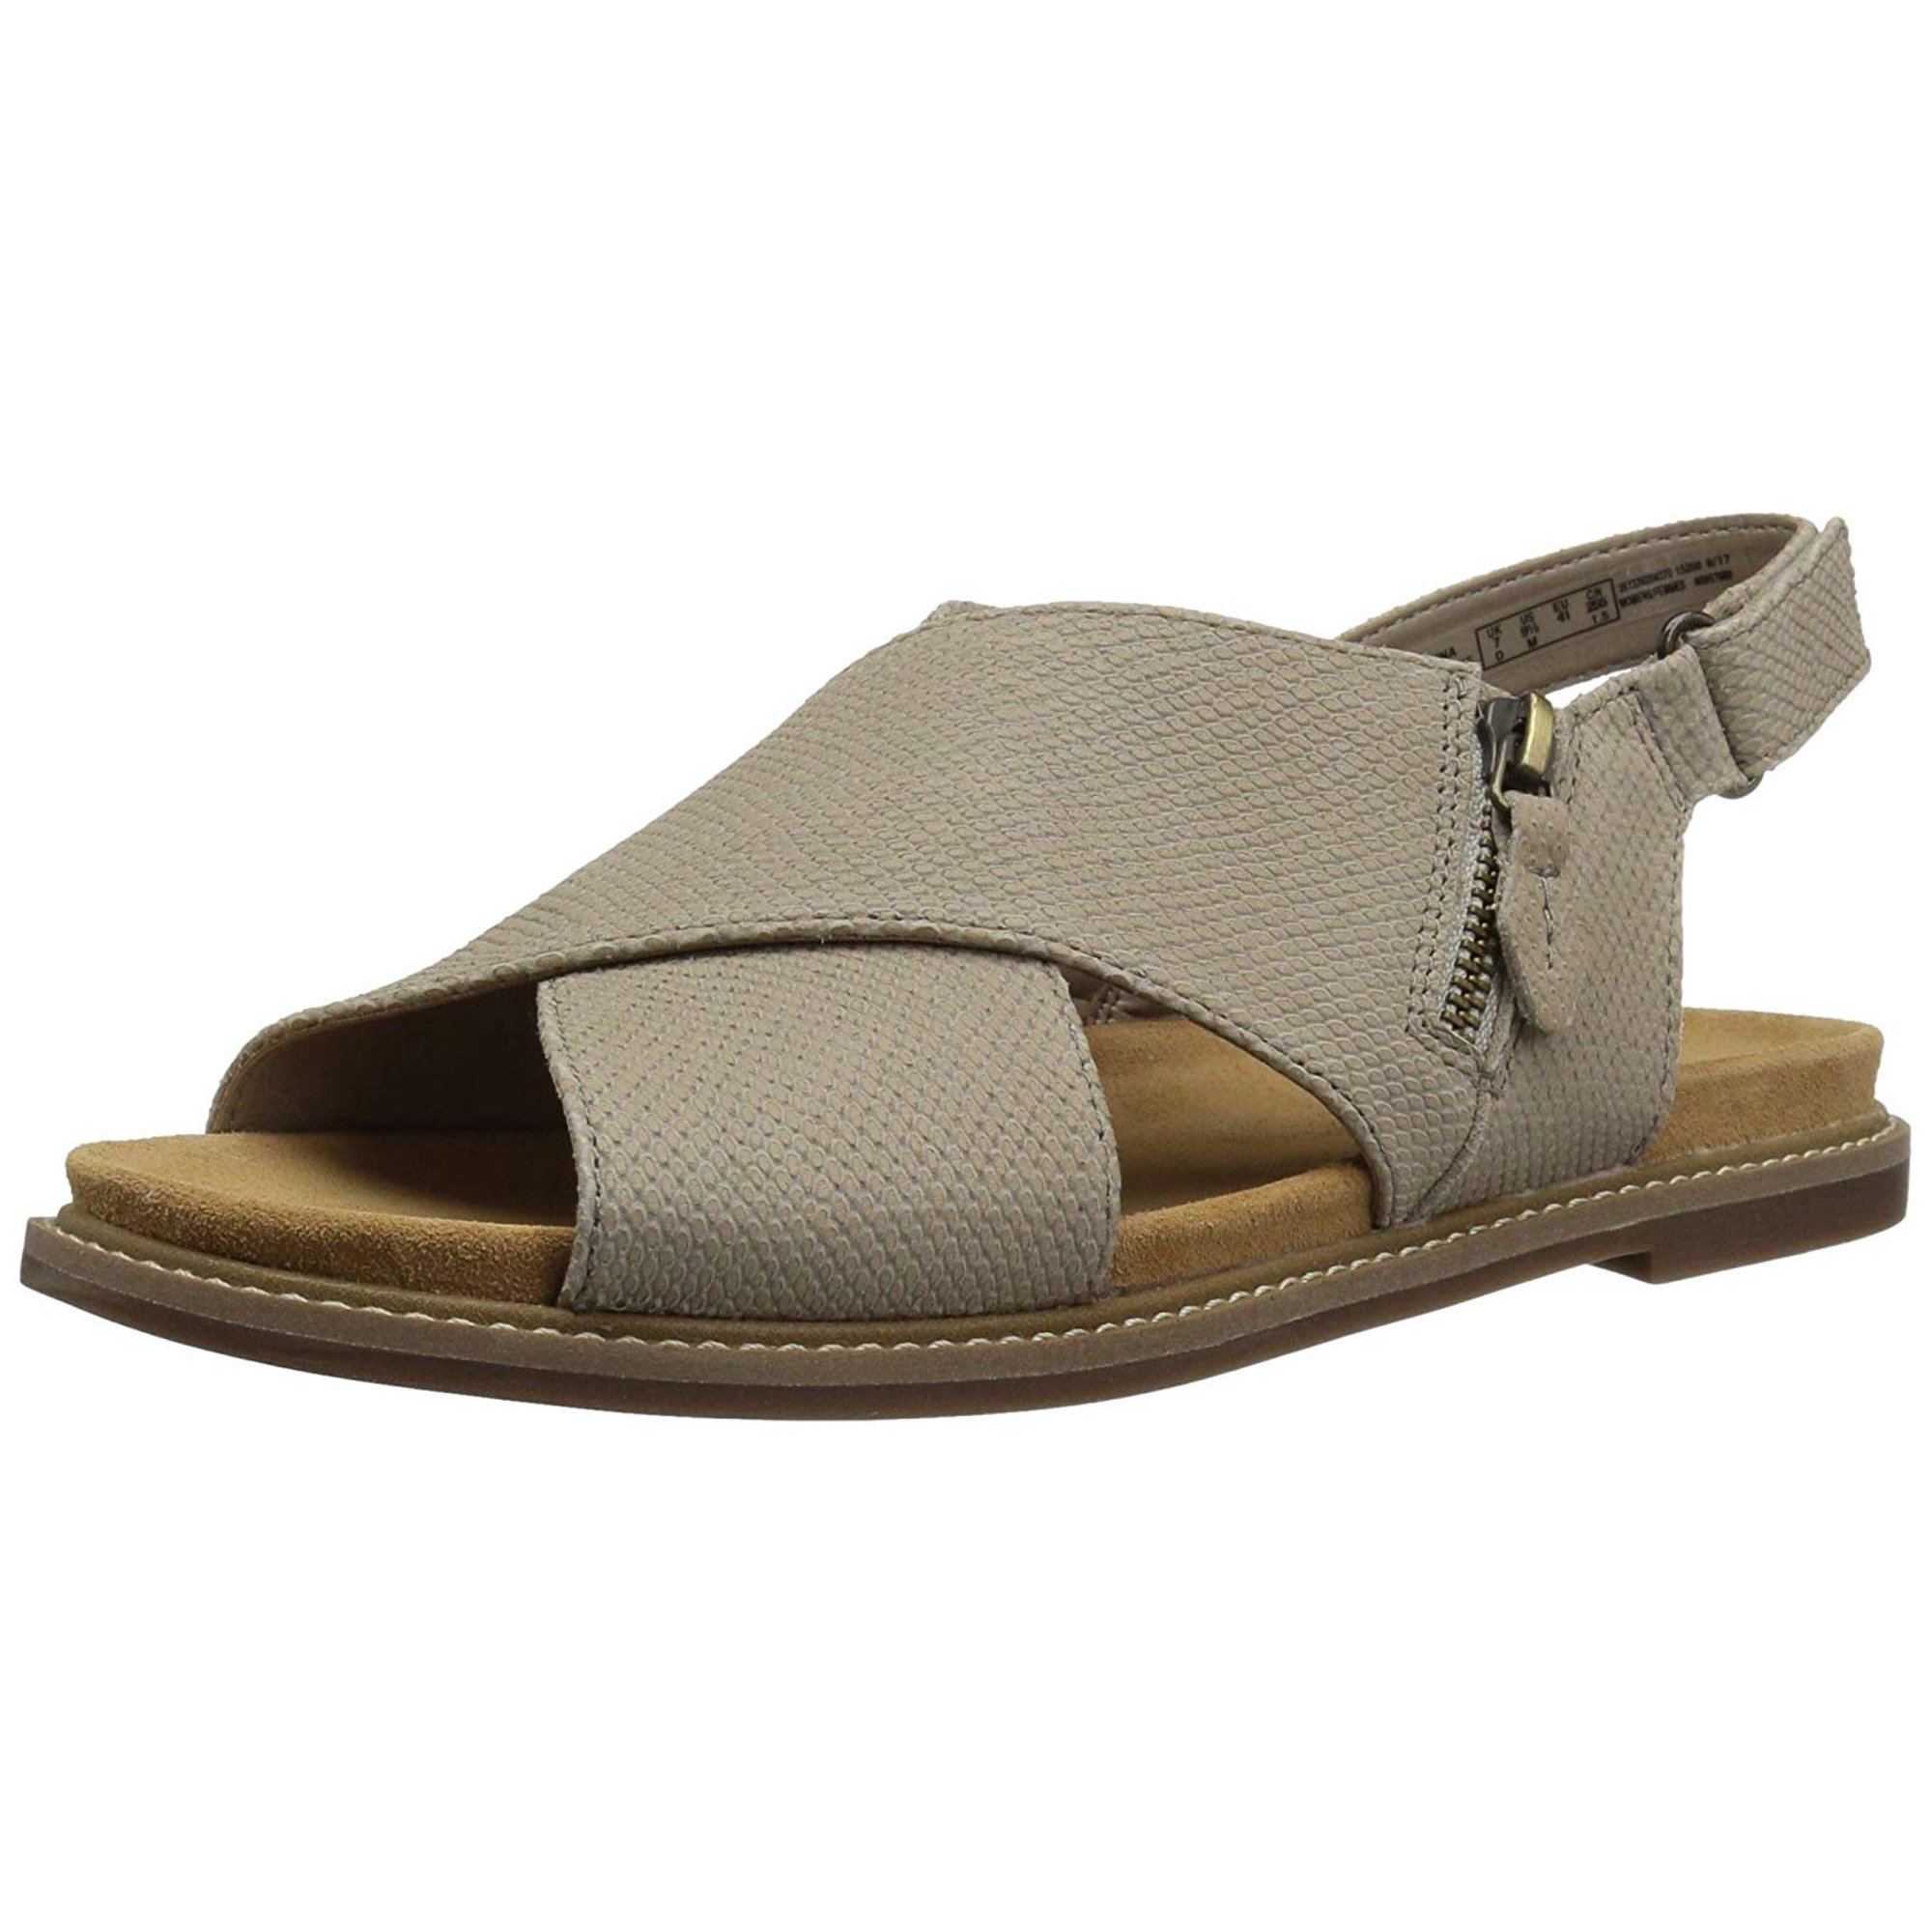 ca3377395582 CLARKS Women s Corsio Calm Flat Sandal